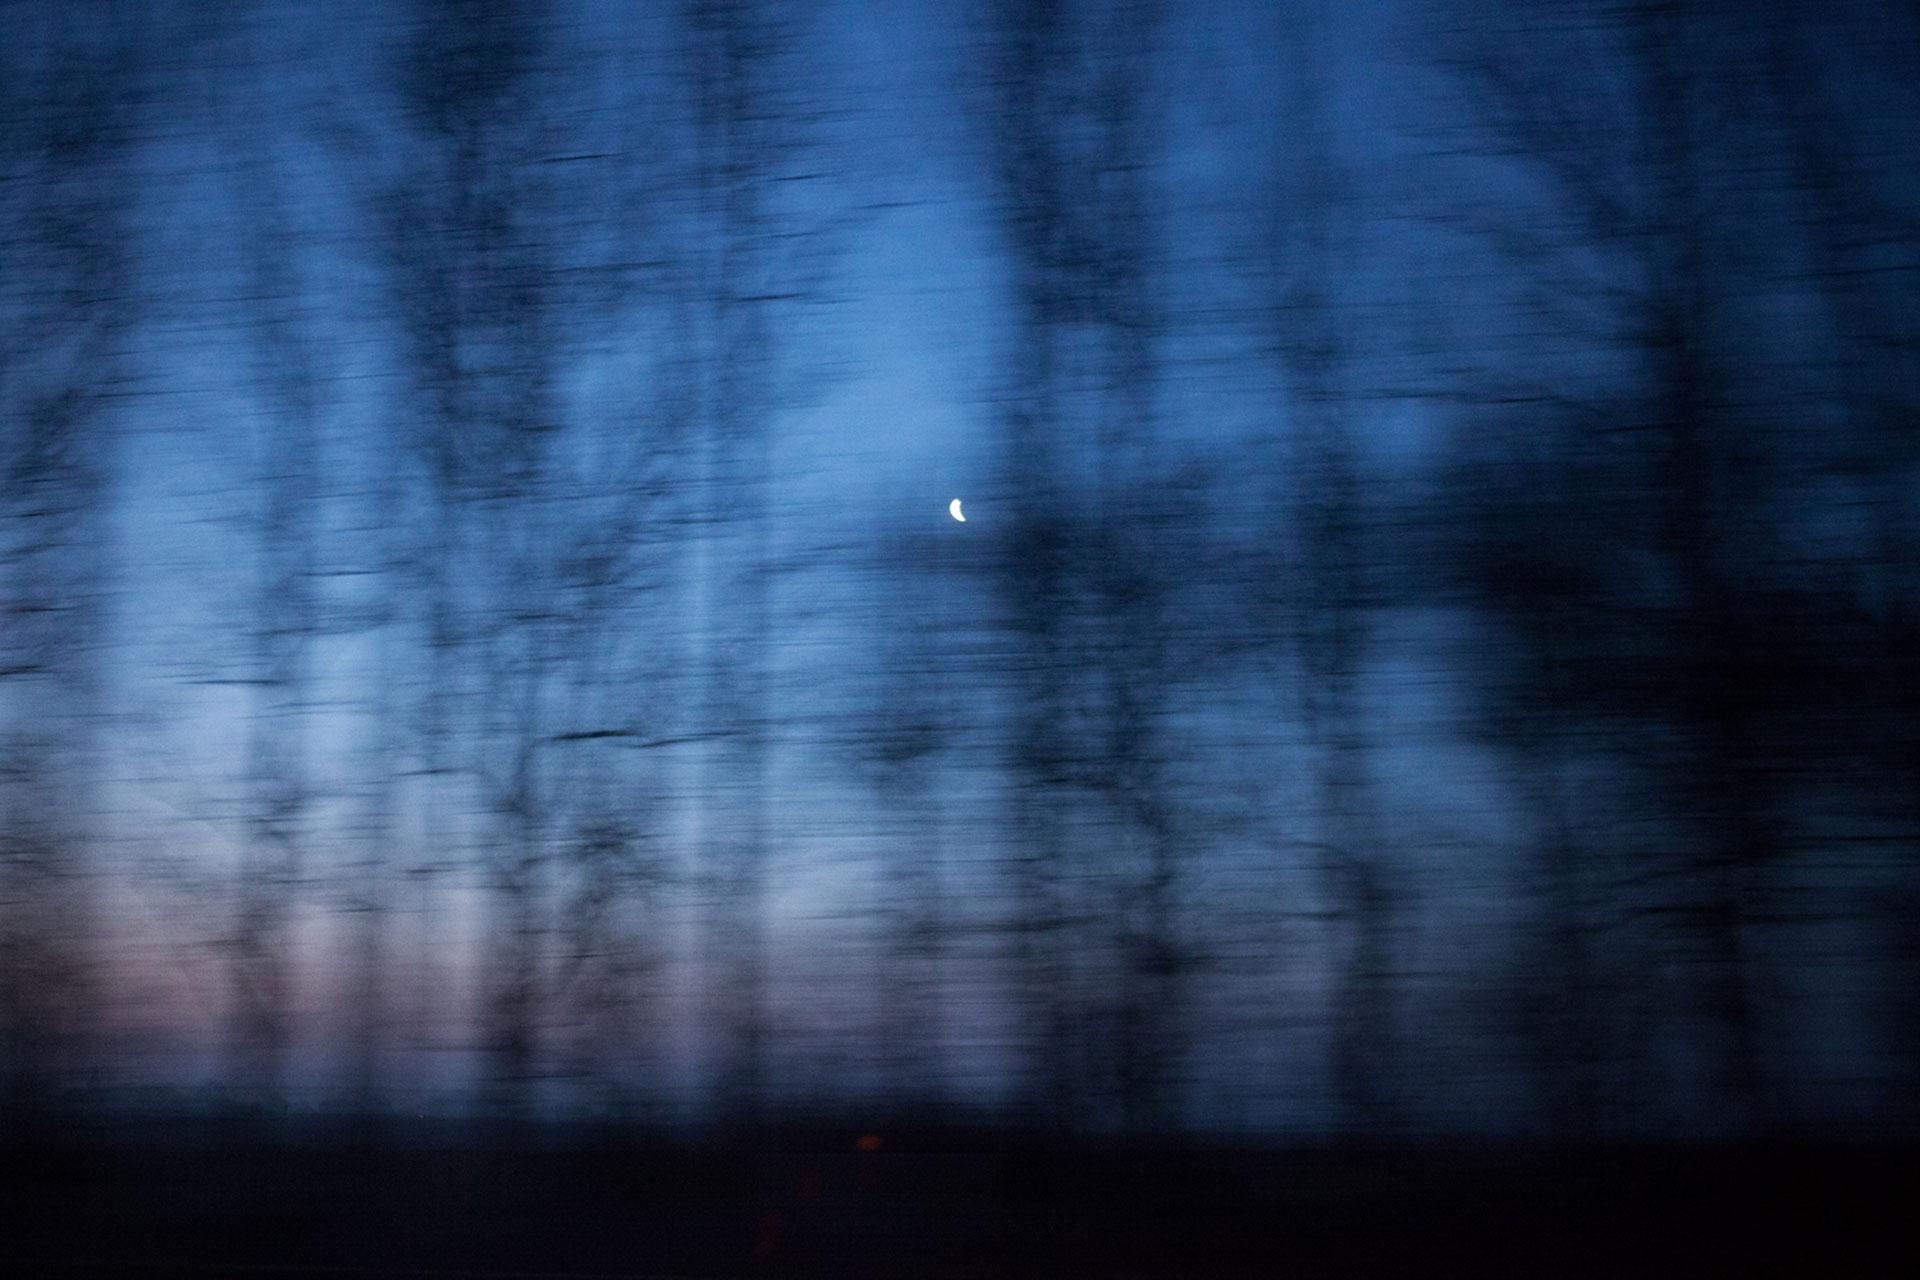 timo-stammberger-photography-fotografie-blue-hour-blurred-treeline-moon-mond-blaue-stunde